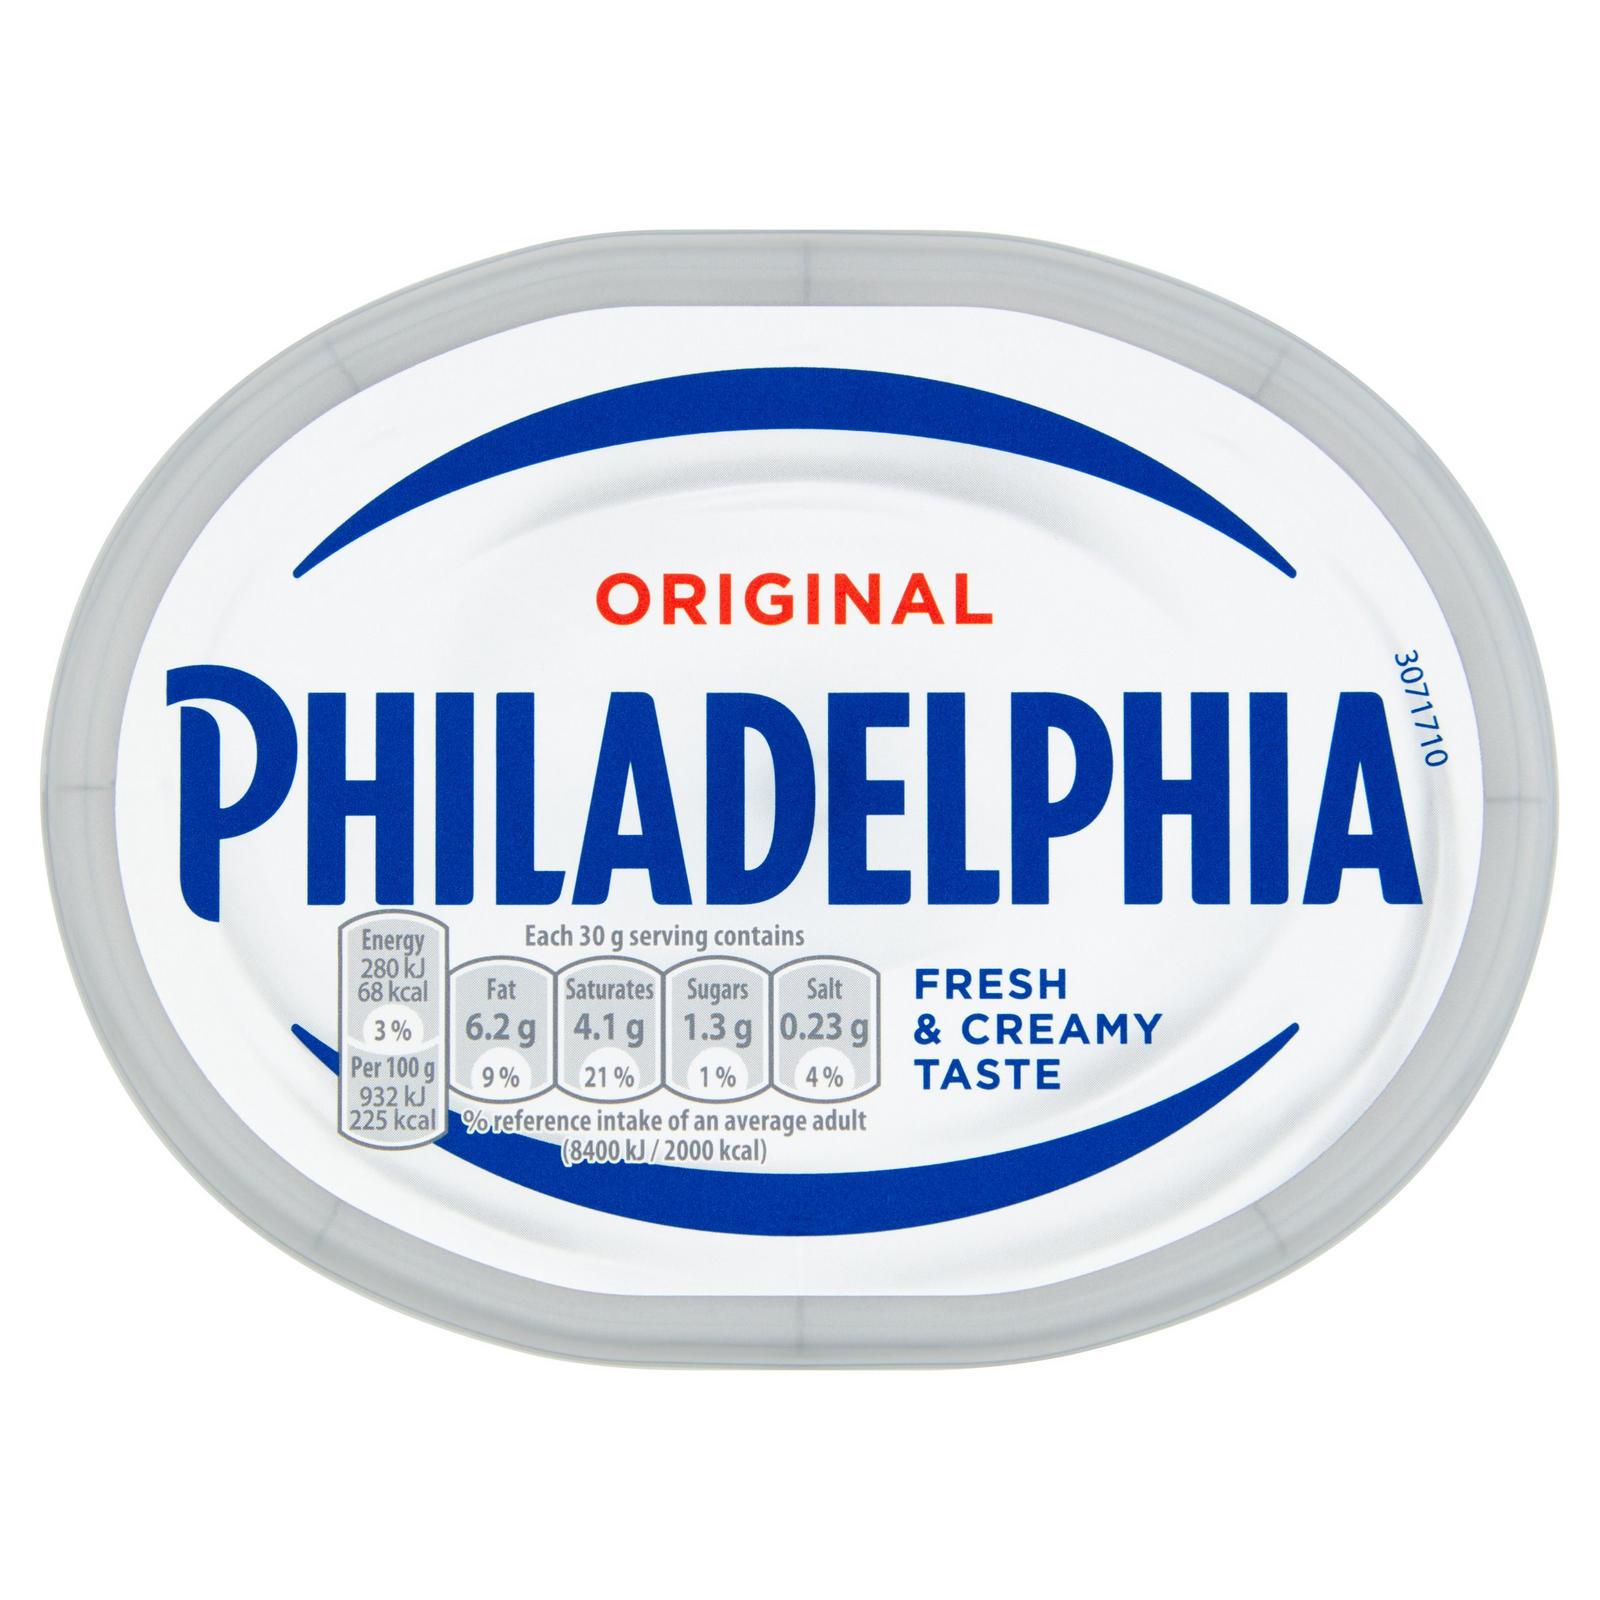 Philadelphia cheese Original and Light 180g - £1 instore @ Co-operative